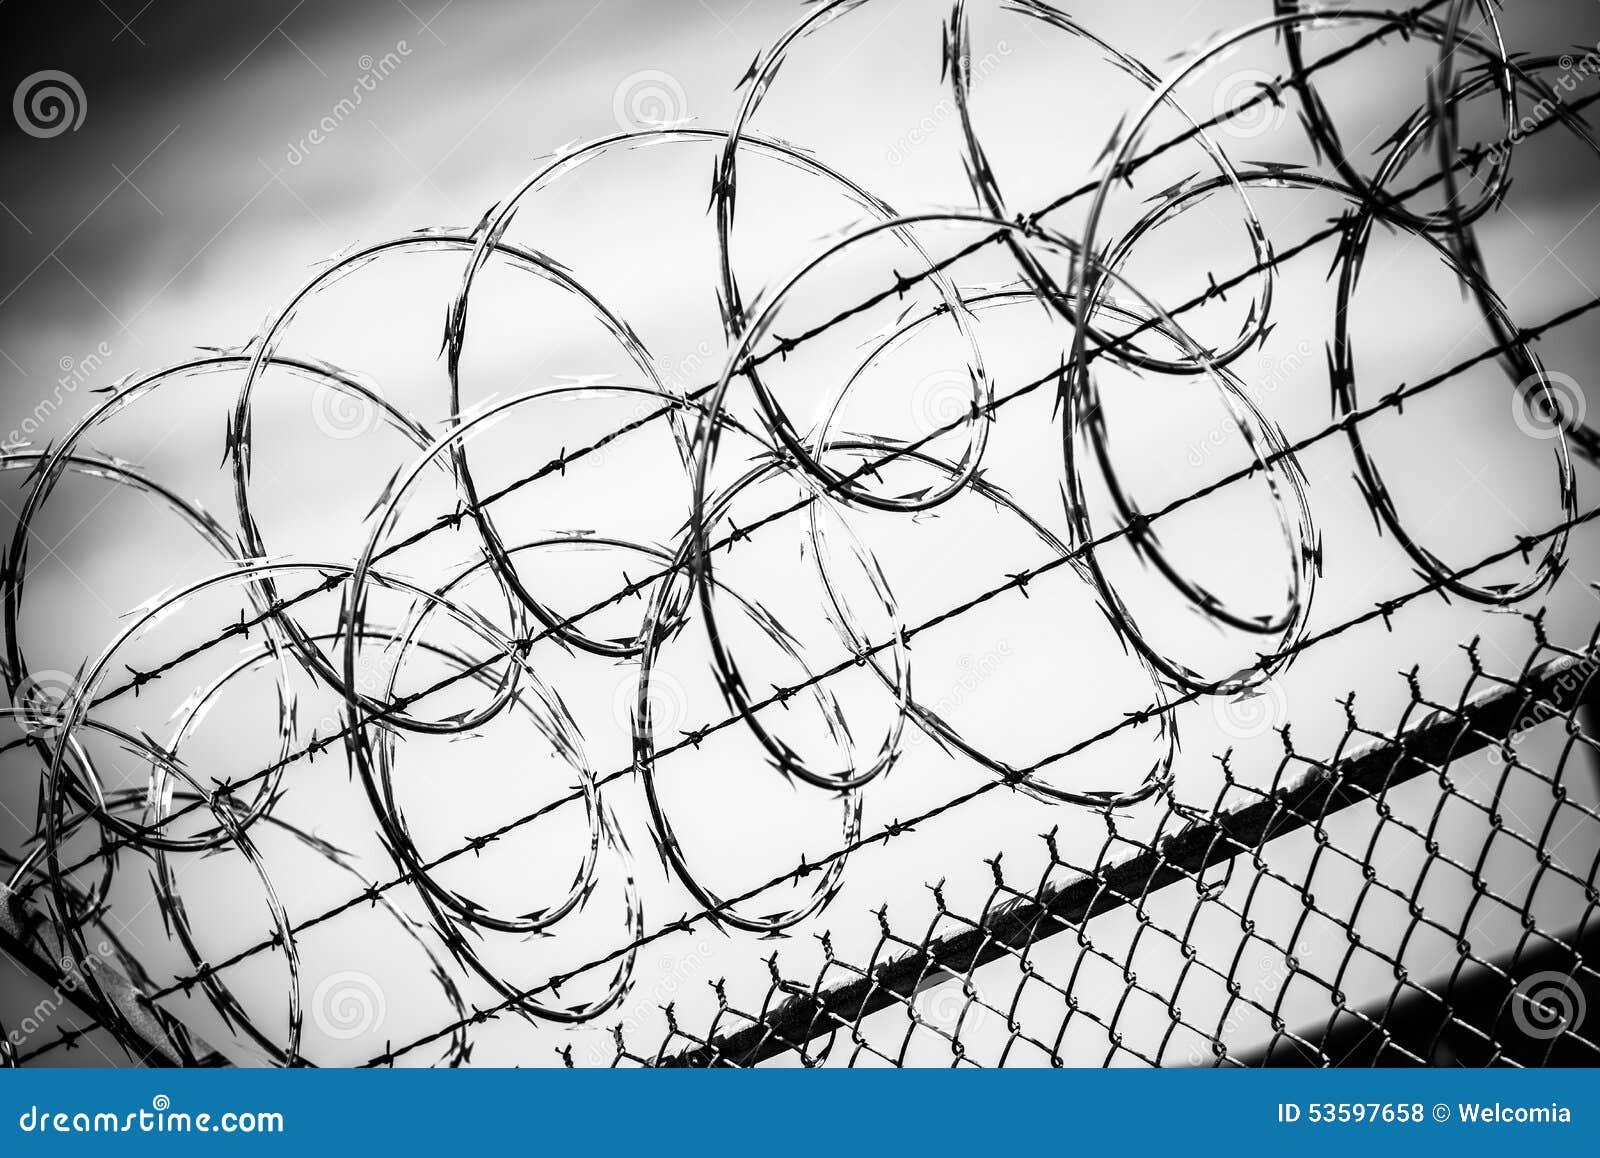 Amazing Concertina Wire Fence Adornment - Wiring Standart ...